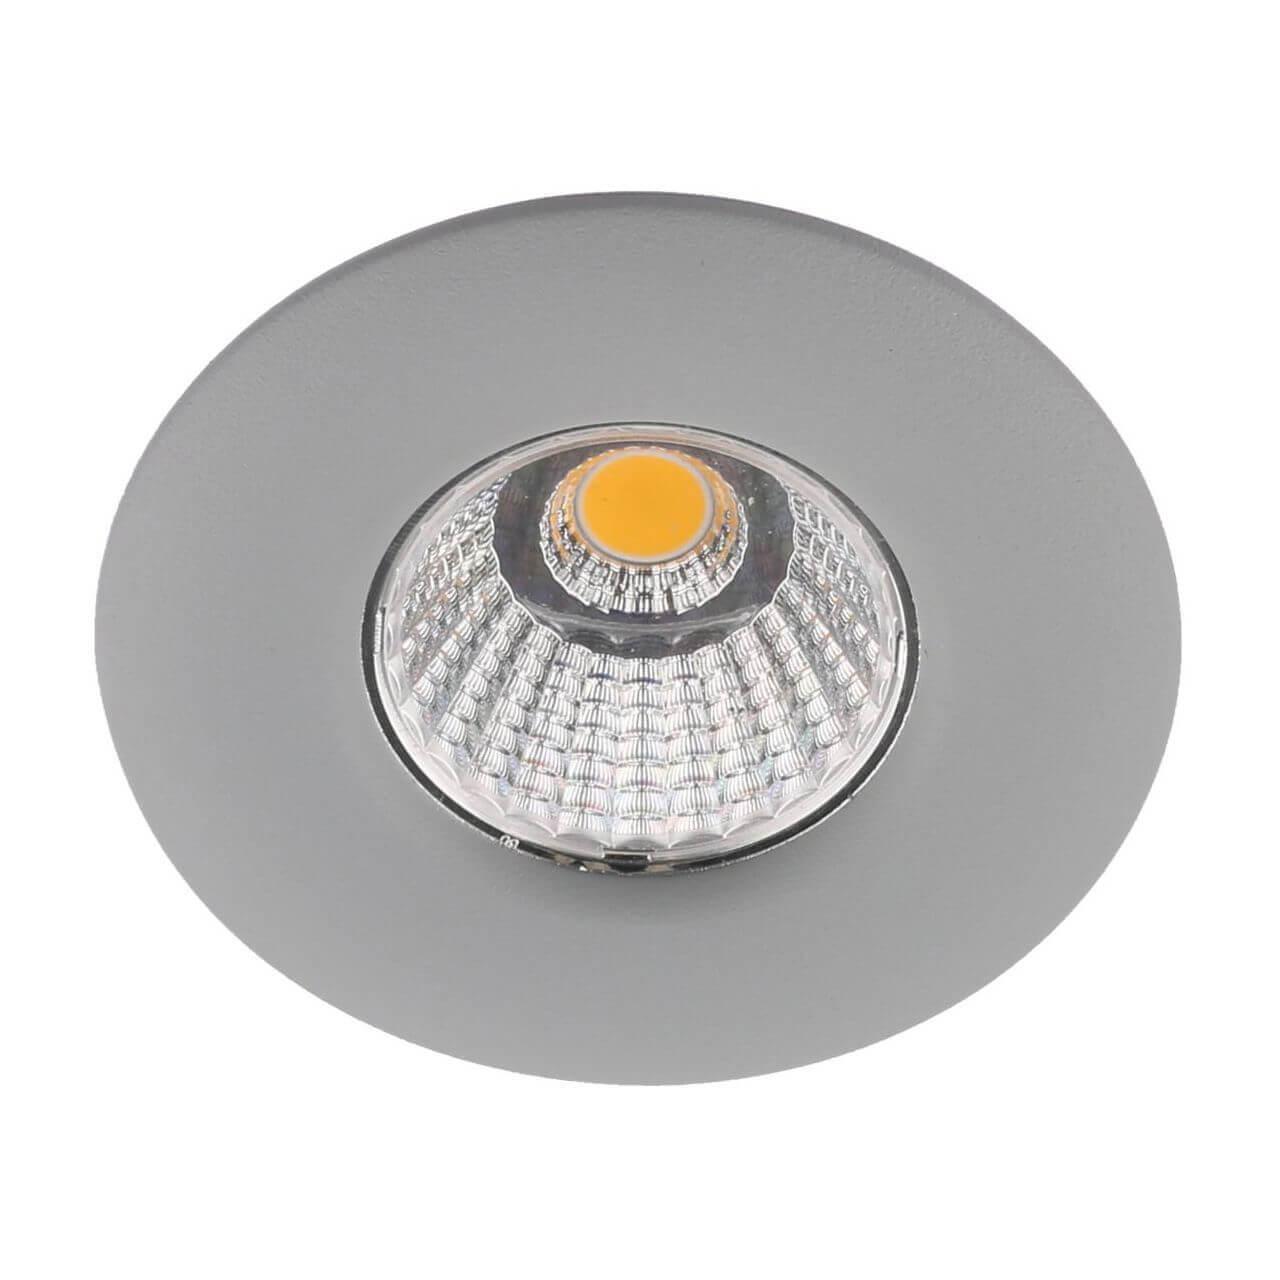 Светильник Arte Lamp A1425PL-1GY Uovo